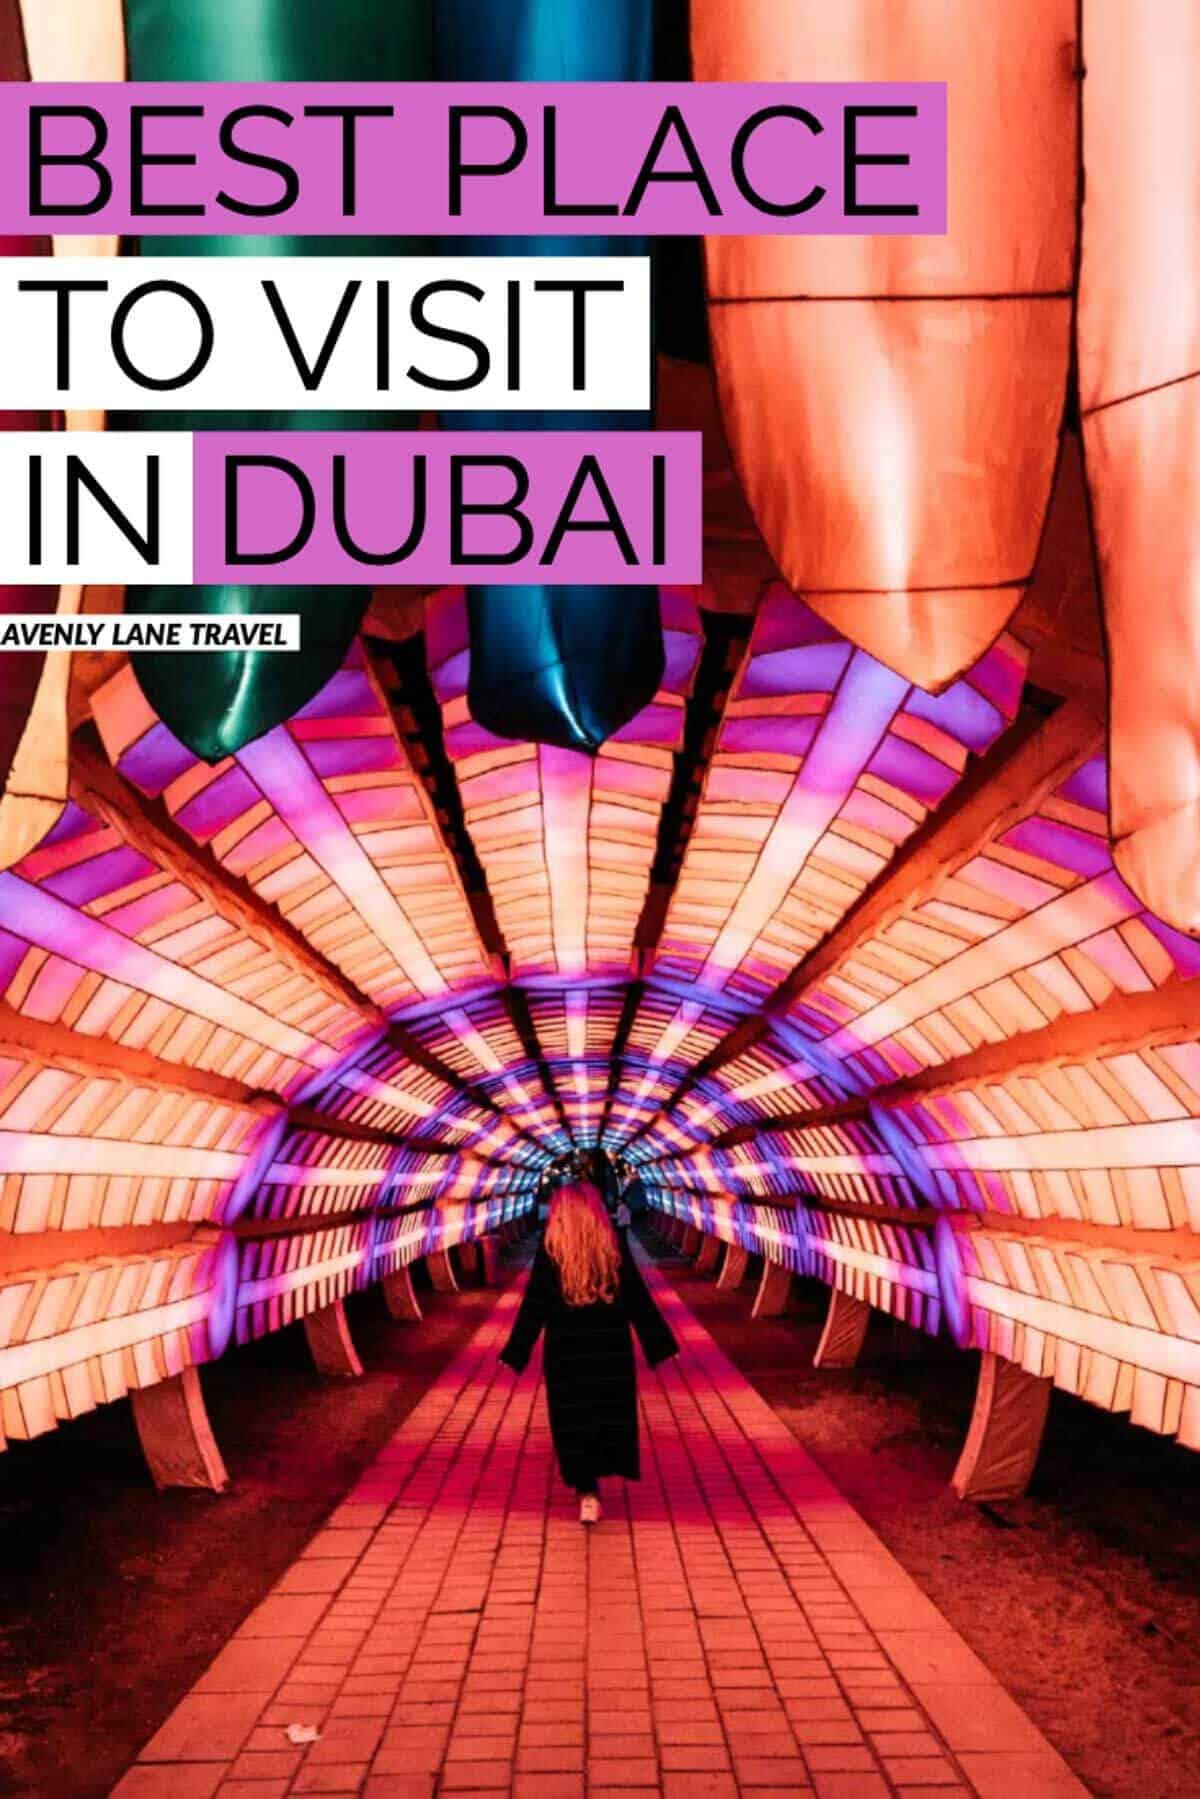 Dubai Garden Glow Best Place To Visit In Dubai At Night Avenly Lane Travel